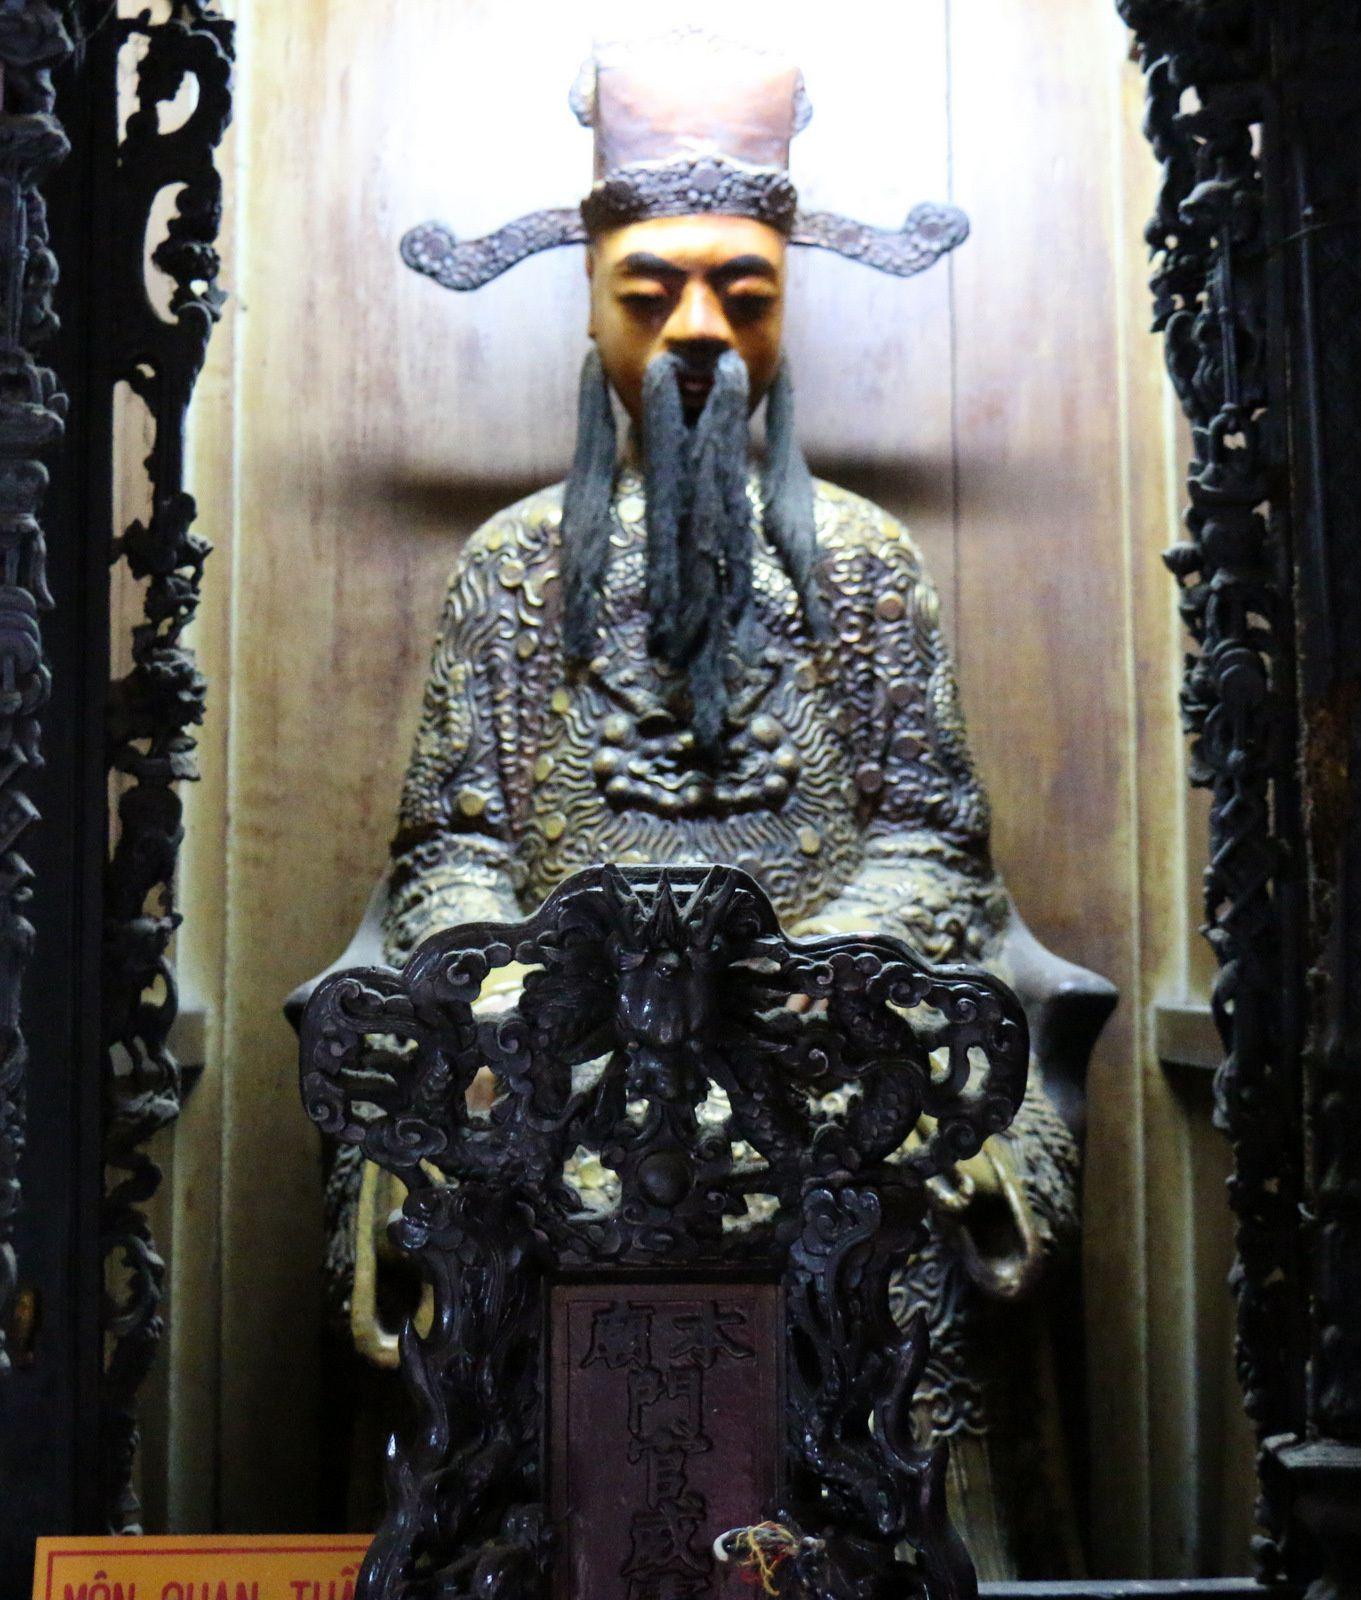 Pagode de l'empereur Jade (l'intérieur), Ho-Chi-Minh-Ville